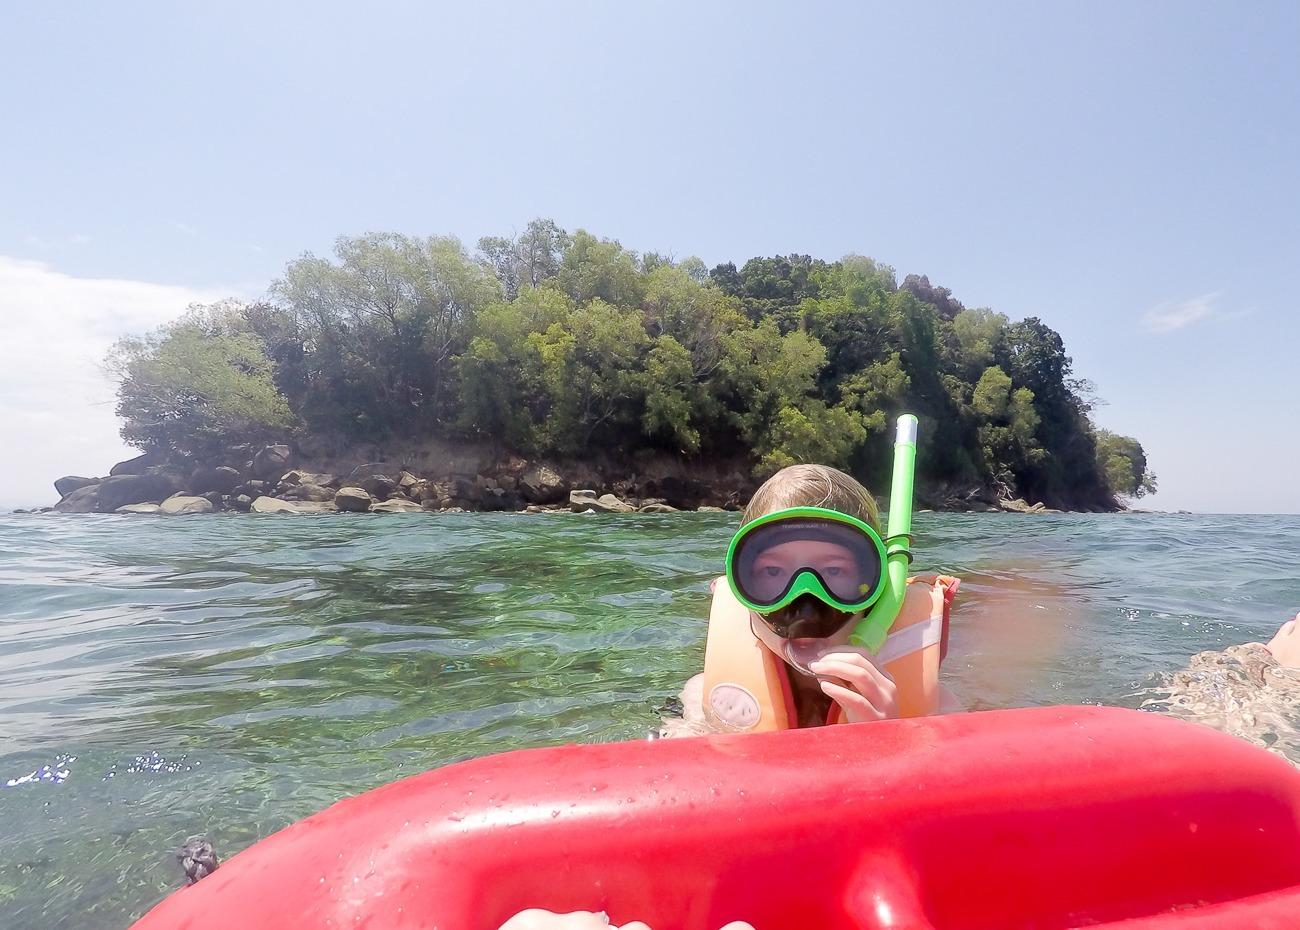 Snorkeling in South China Sea off Mamutik Island